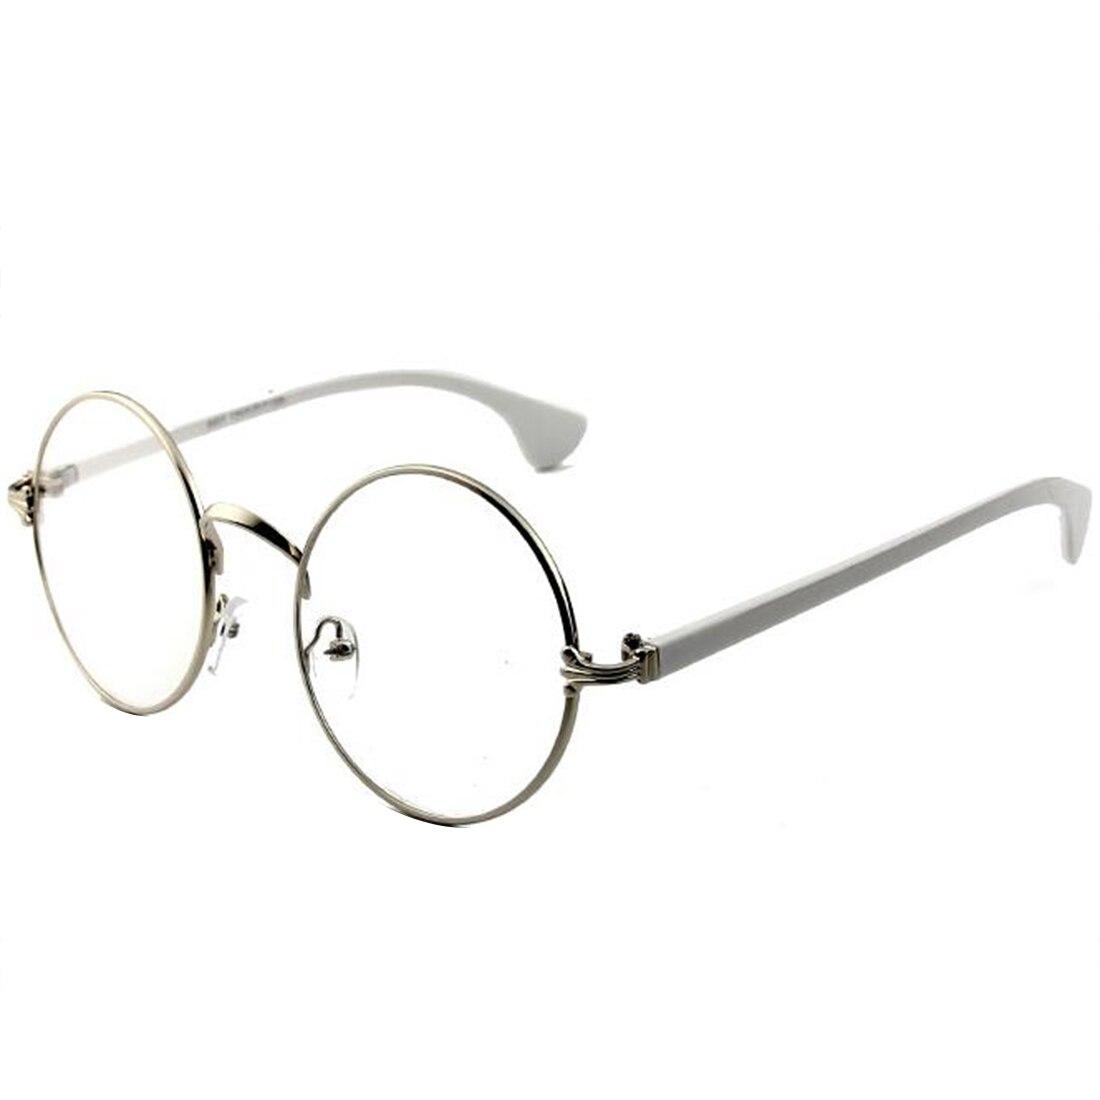 2019 New High quality spring mirror leg Retro Round Glasses Frame Art Fine Flat Mirror Super Light Glasses for Men and Women